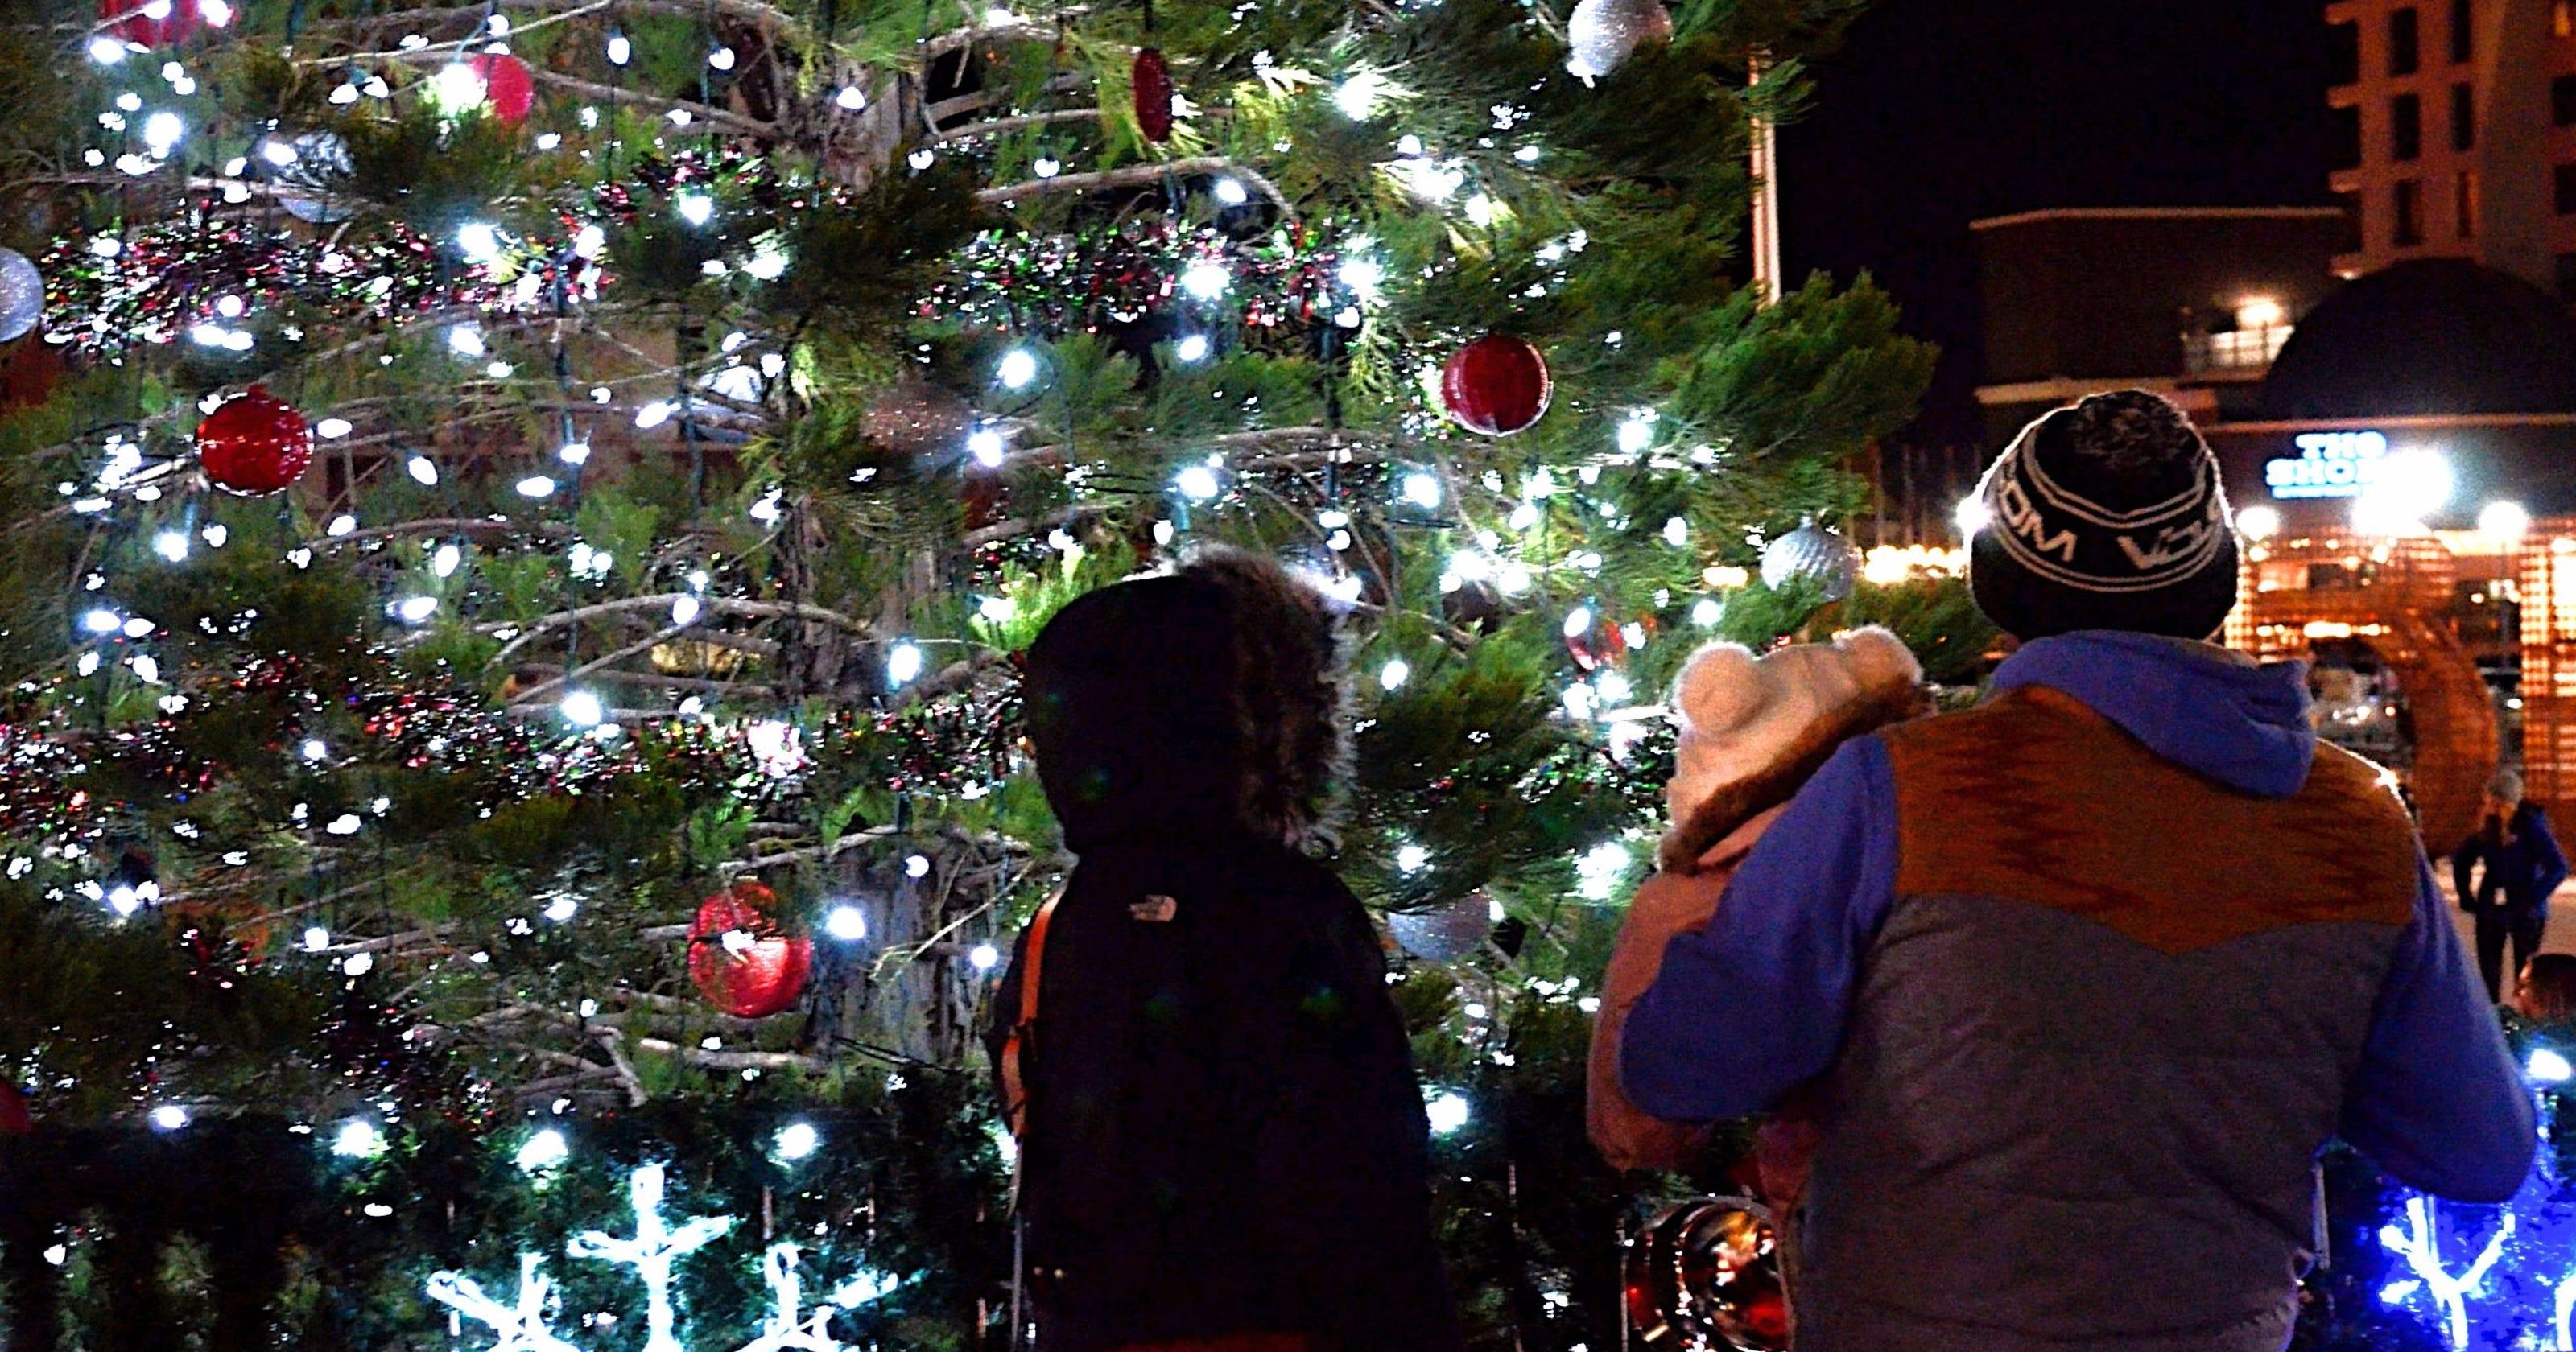 Watch: Reno Christmas Tree Lights Up Downtown